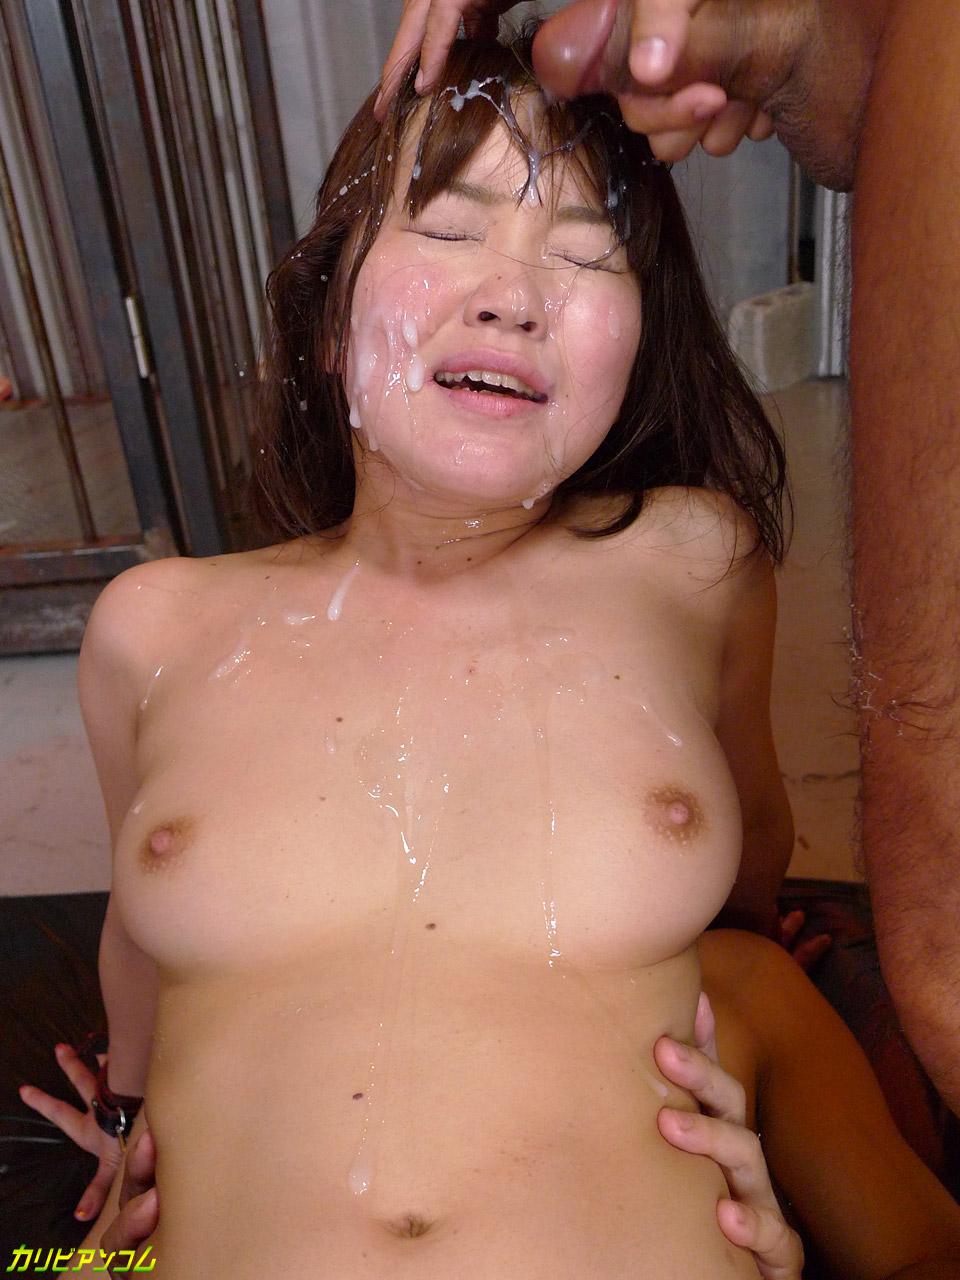 Uncensored japanese gangbang with hairy pussy av idol - 1 part 2